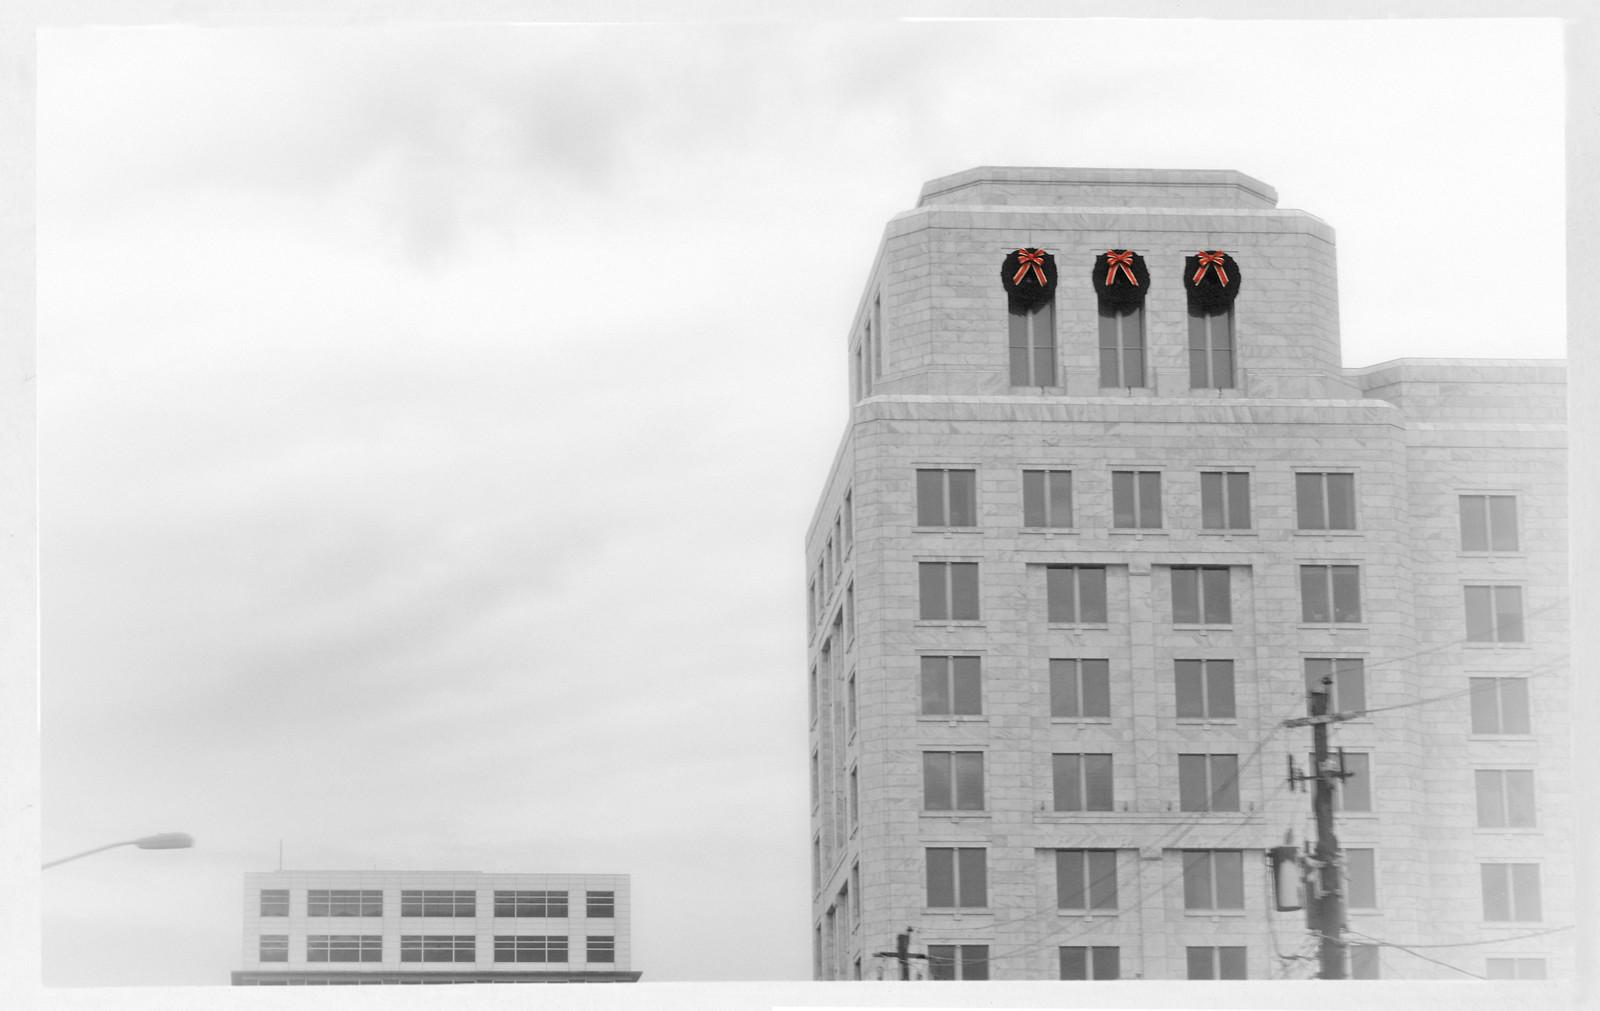 3 Wreaths on the Federal Reserve Bank, Midtown Atlanta